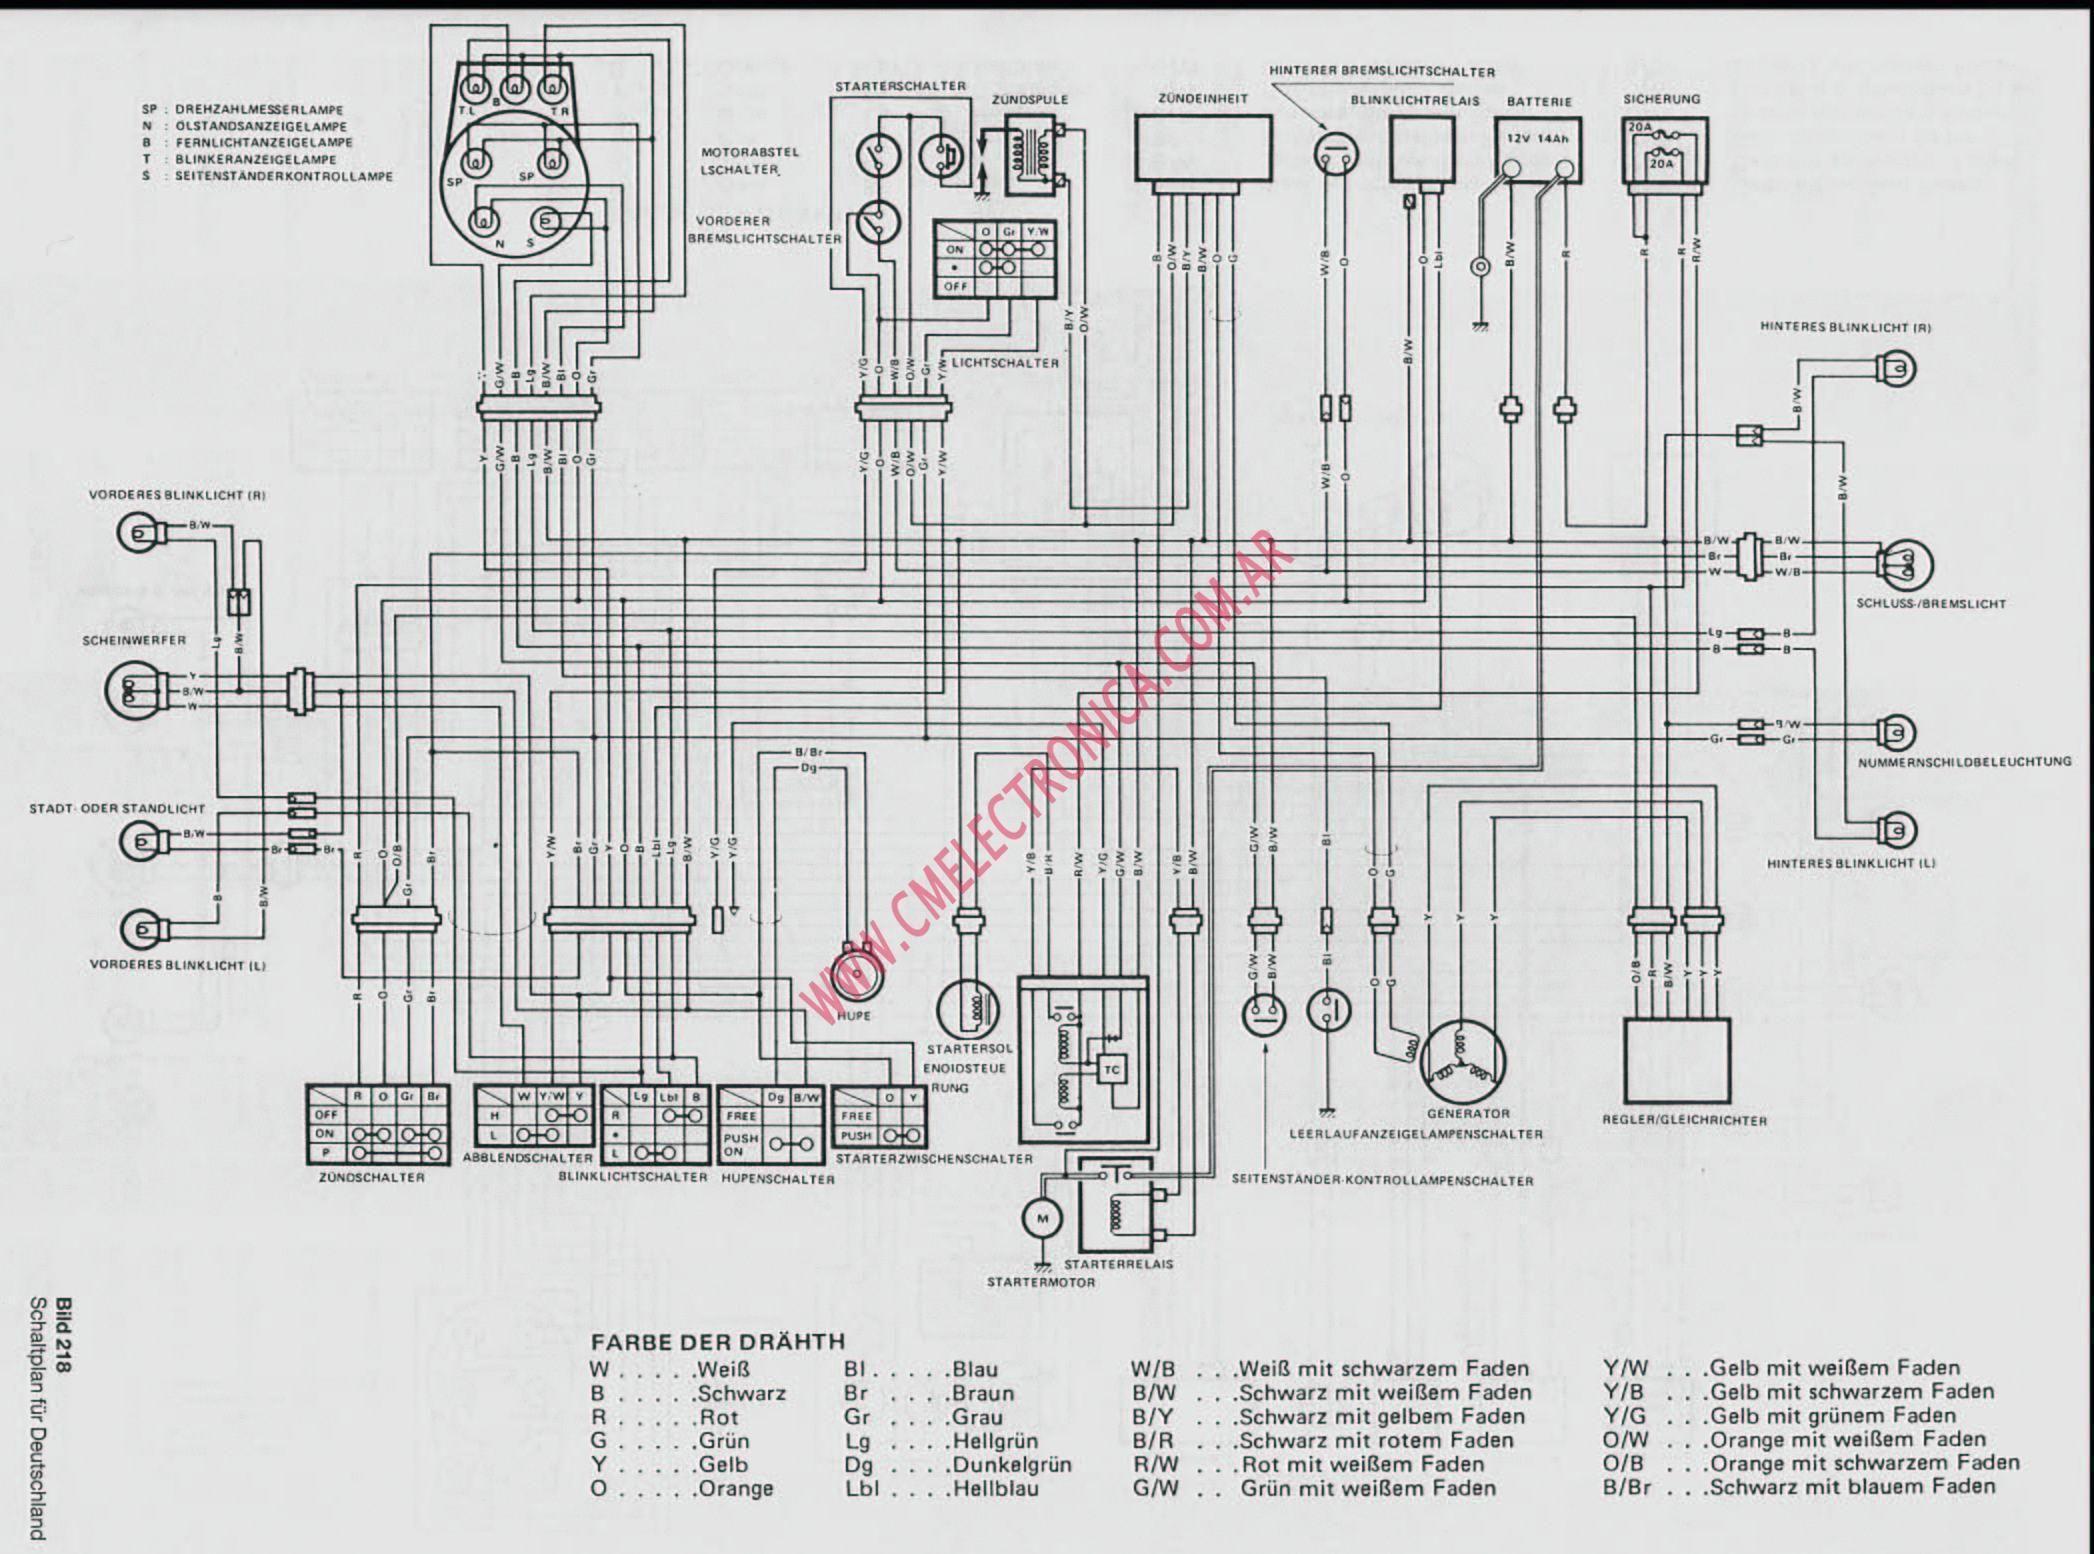 Best Of Diagram Suzuki Vl1500 Wiring Diagram Millions Ideas Diagram And Concept Wiring Diagram Diagram Toyota Tacoma Electrical Wiring Diagram